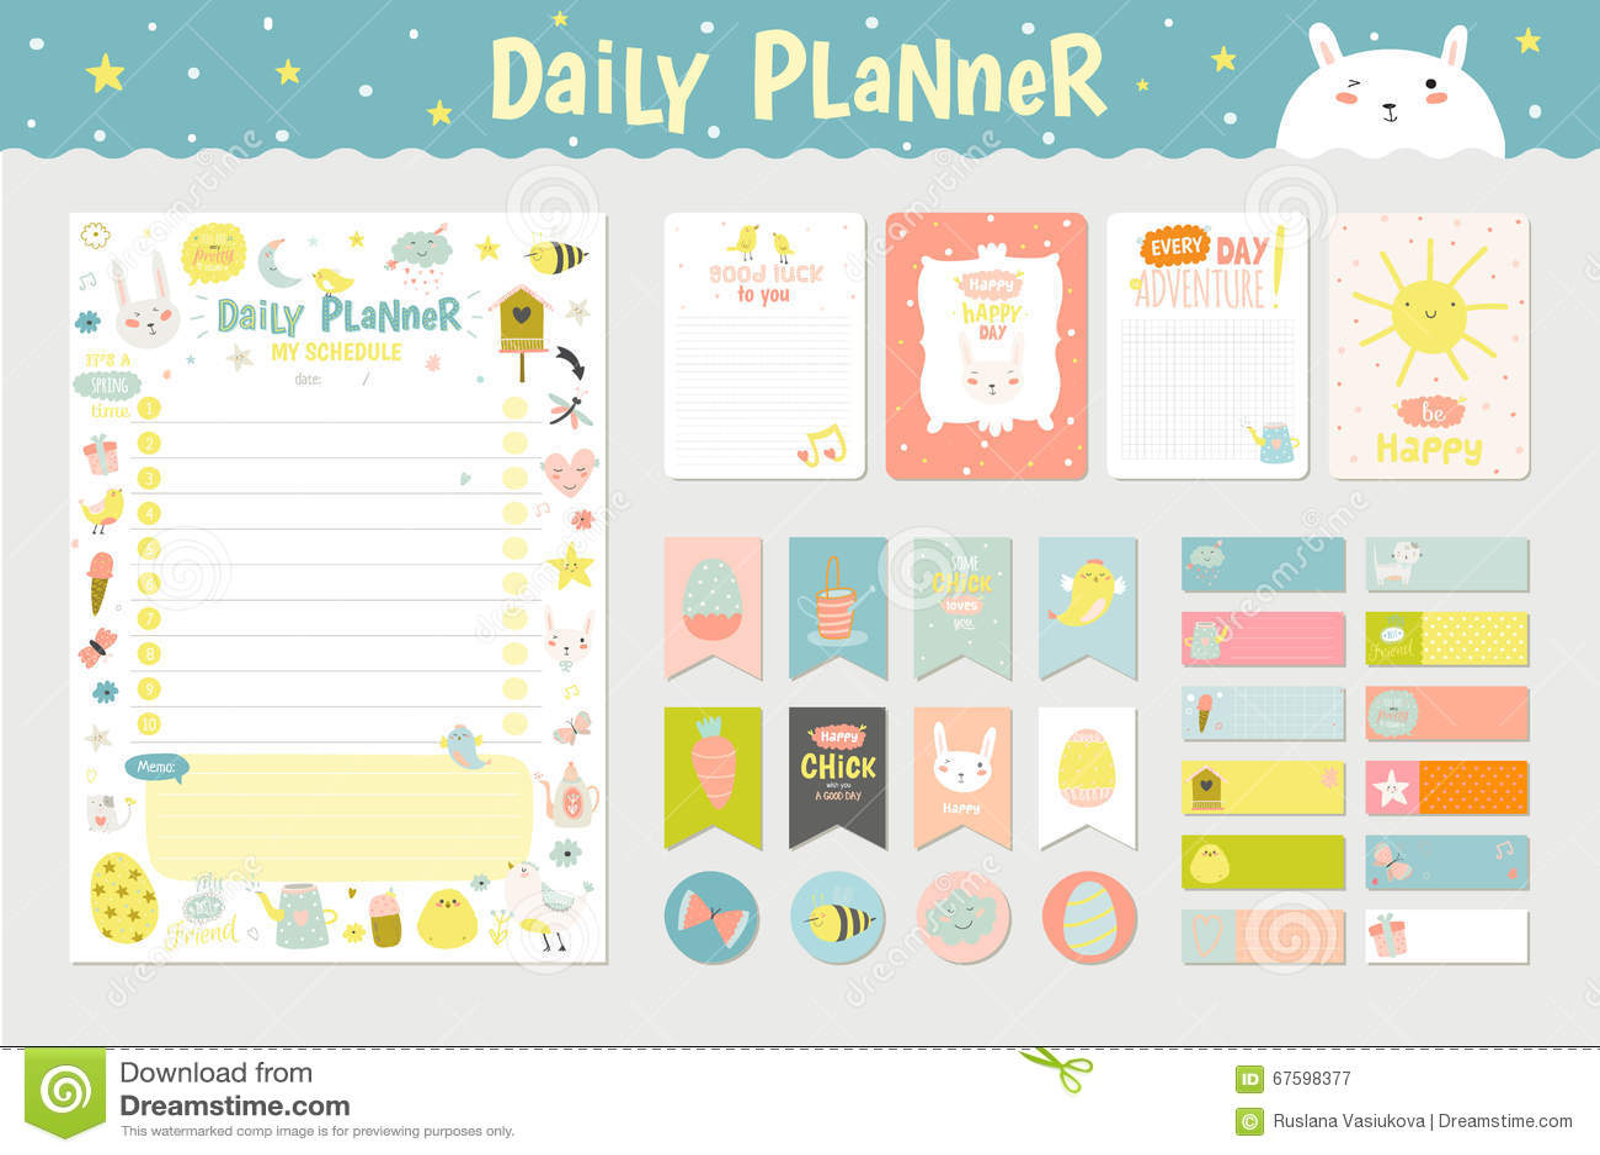 Calendar Planner Vector Free : Cute calendar daily planner stock vector image